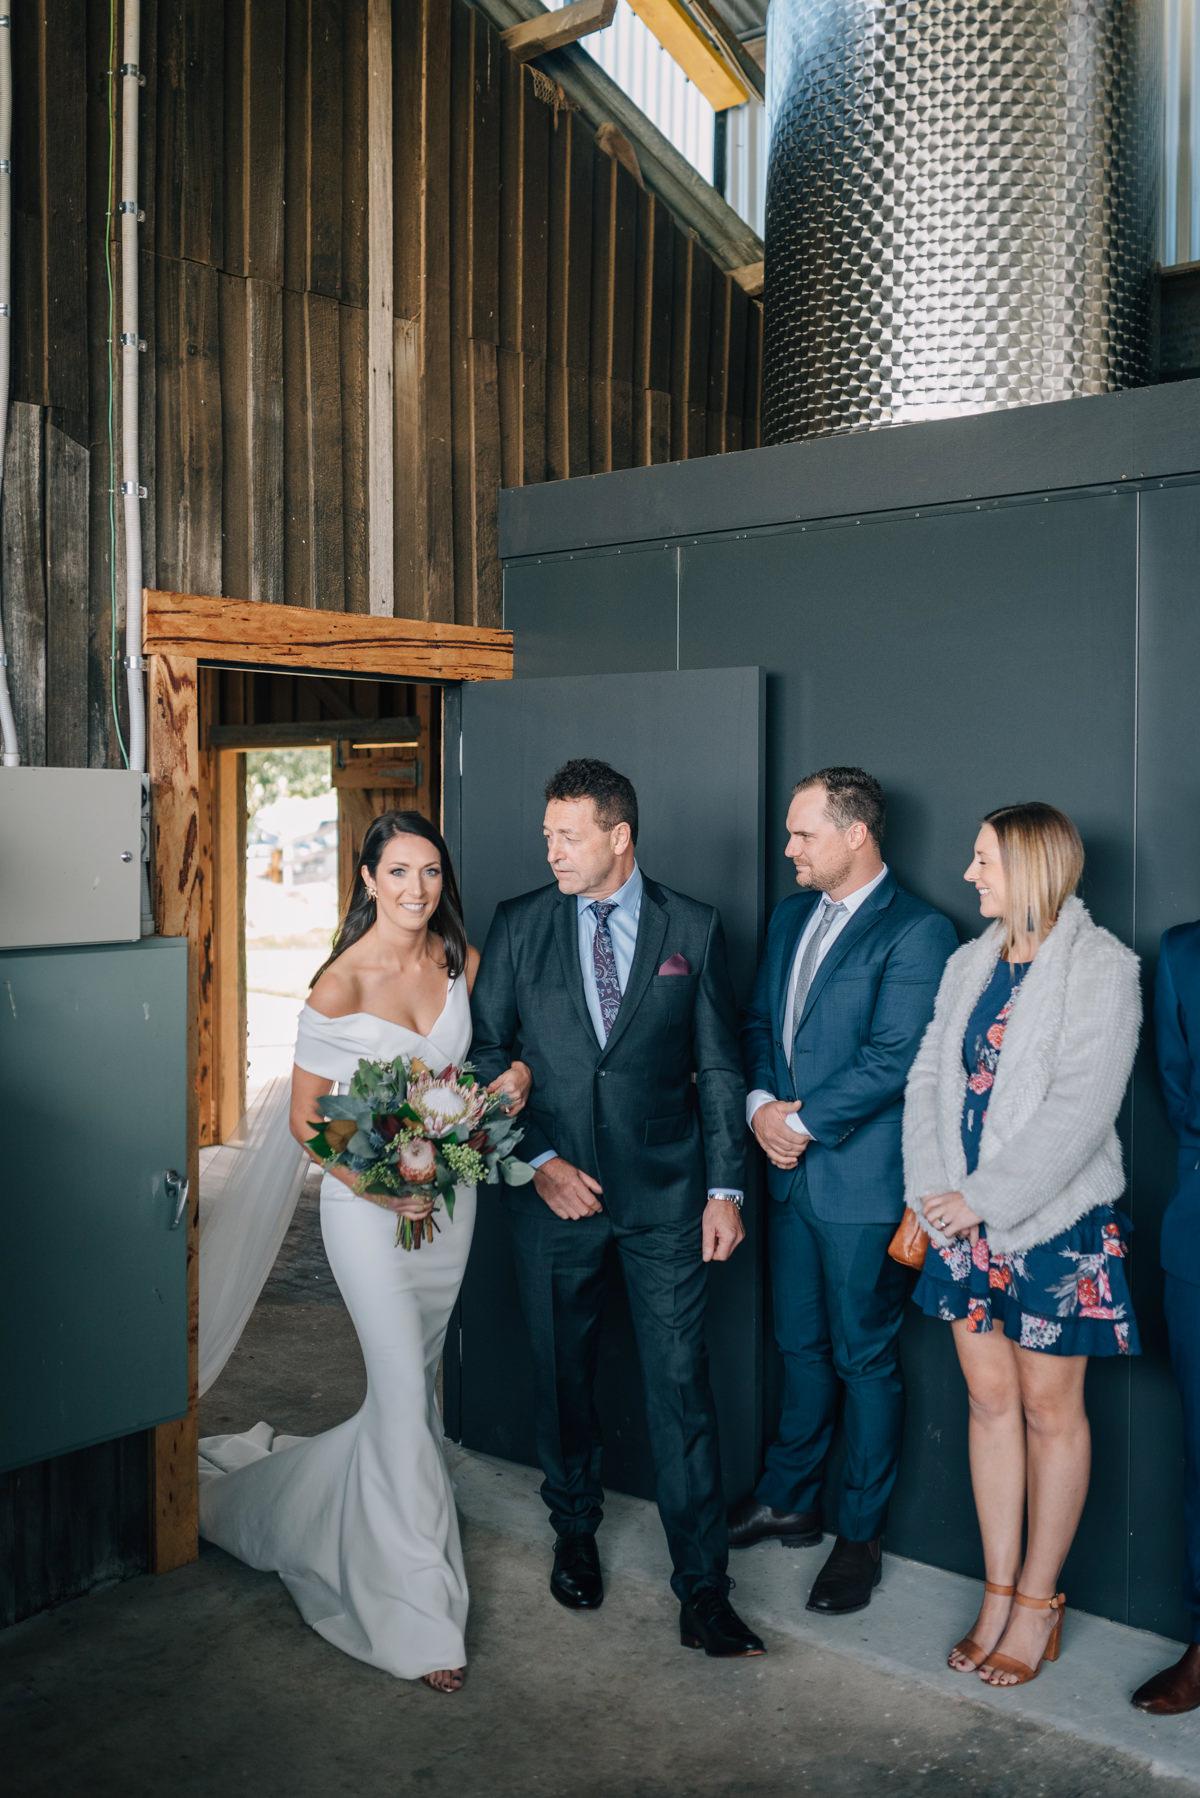 Wedding-Photohraphy-Launceston-Wines-For-Joanie-22.jpg